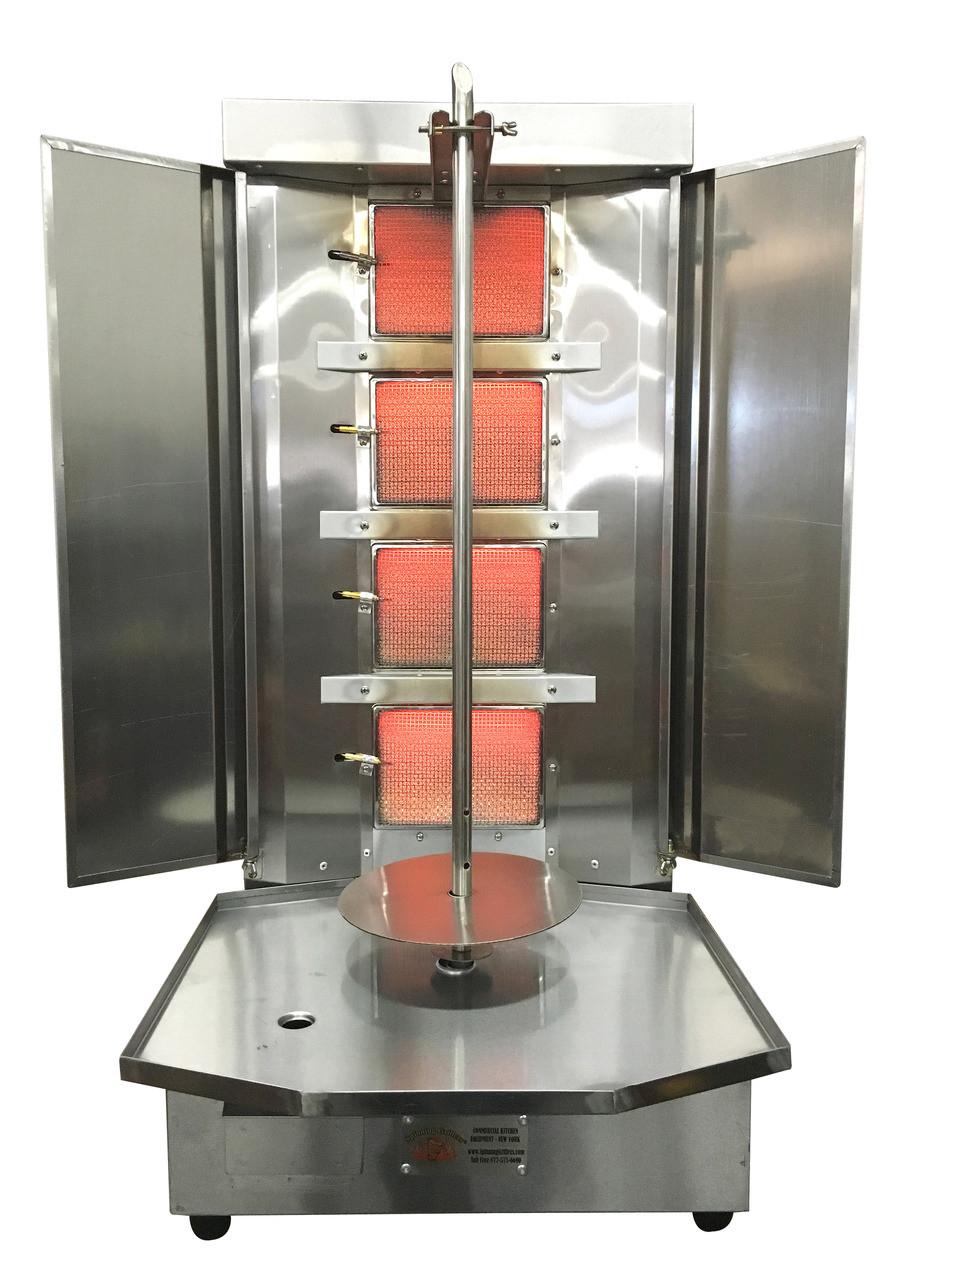 shawarma machine vertical broiler with 4 burners sg3